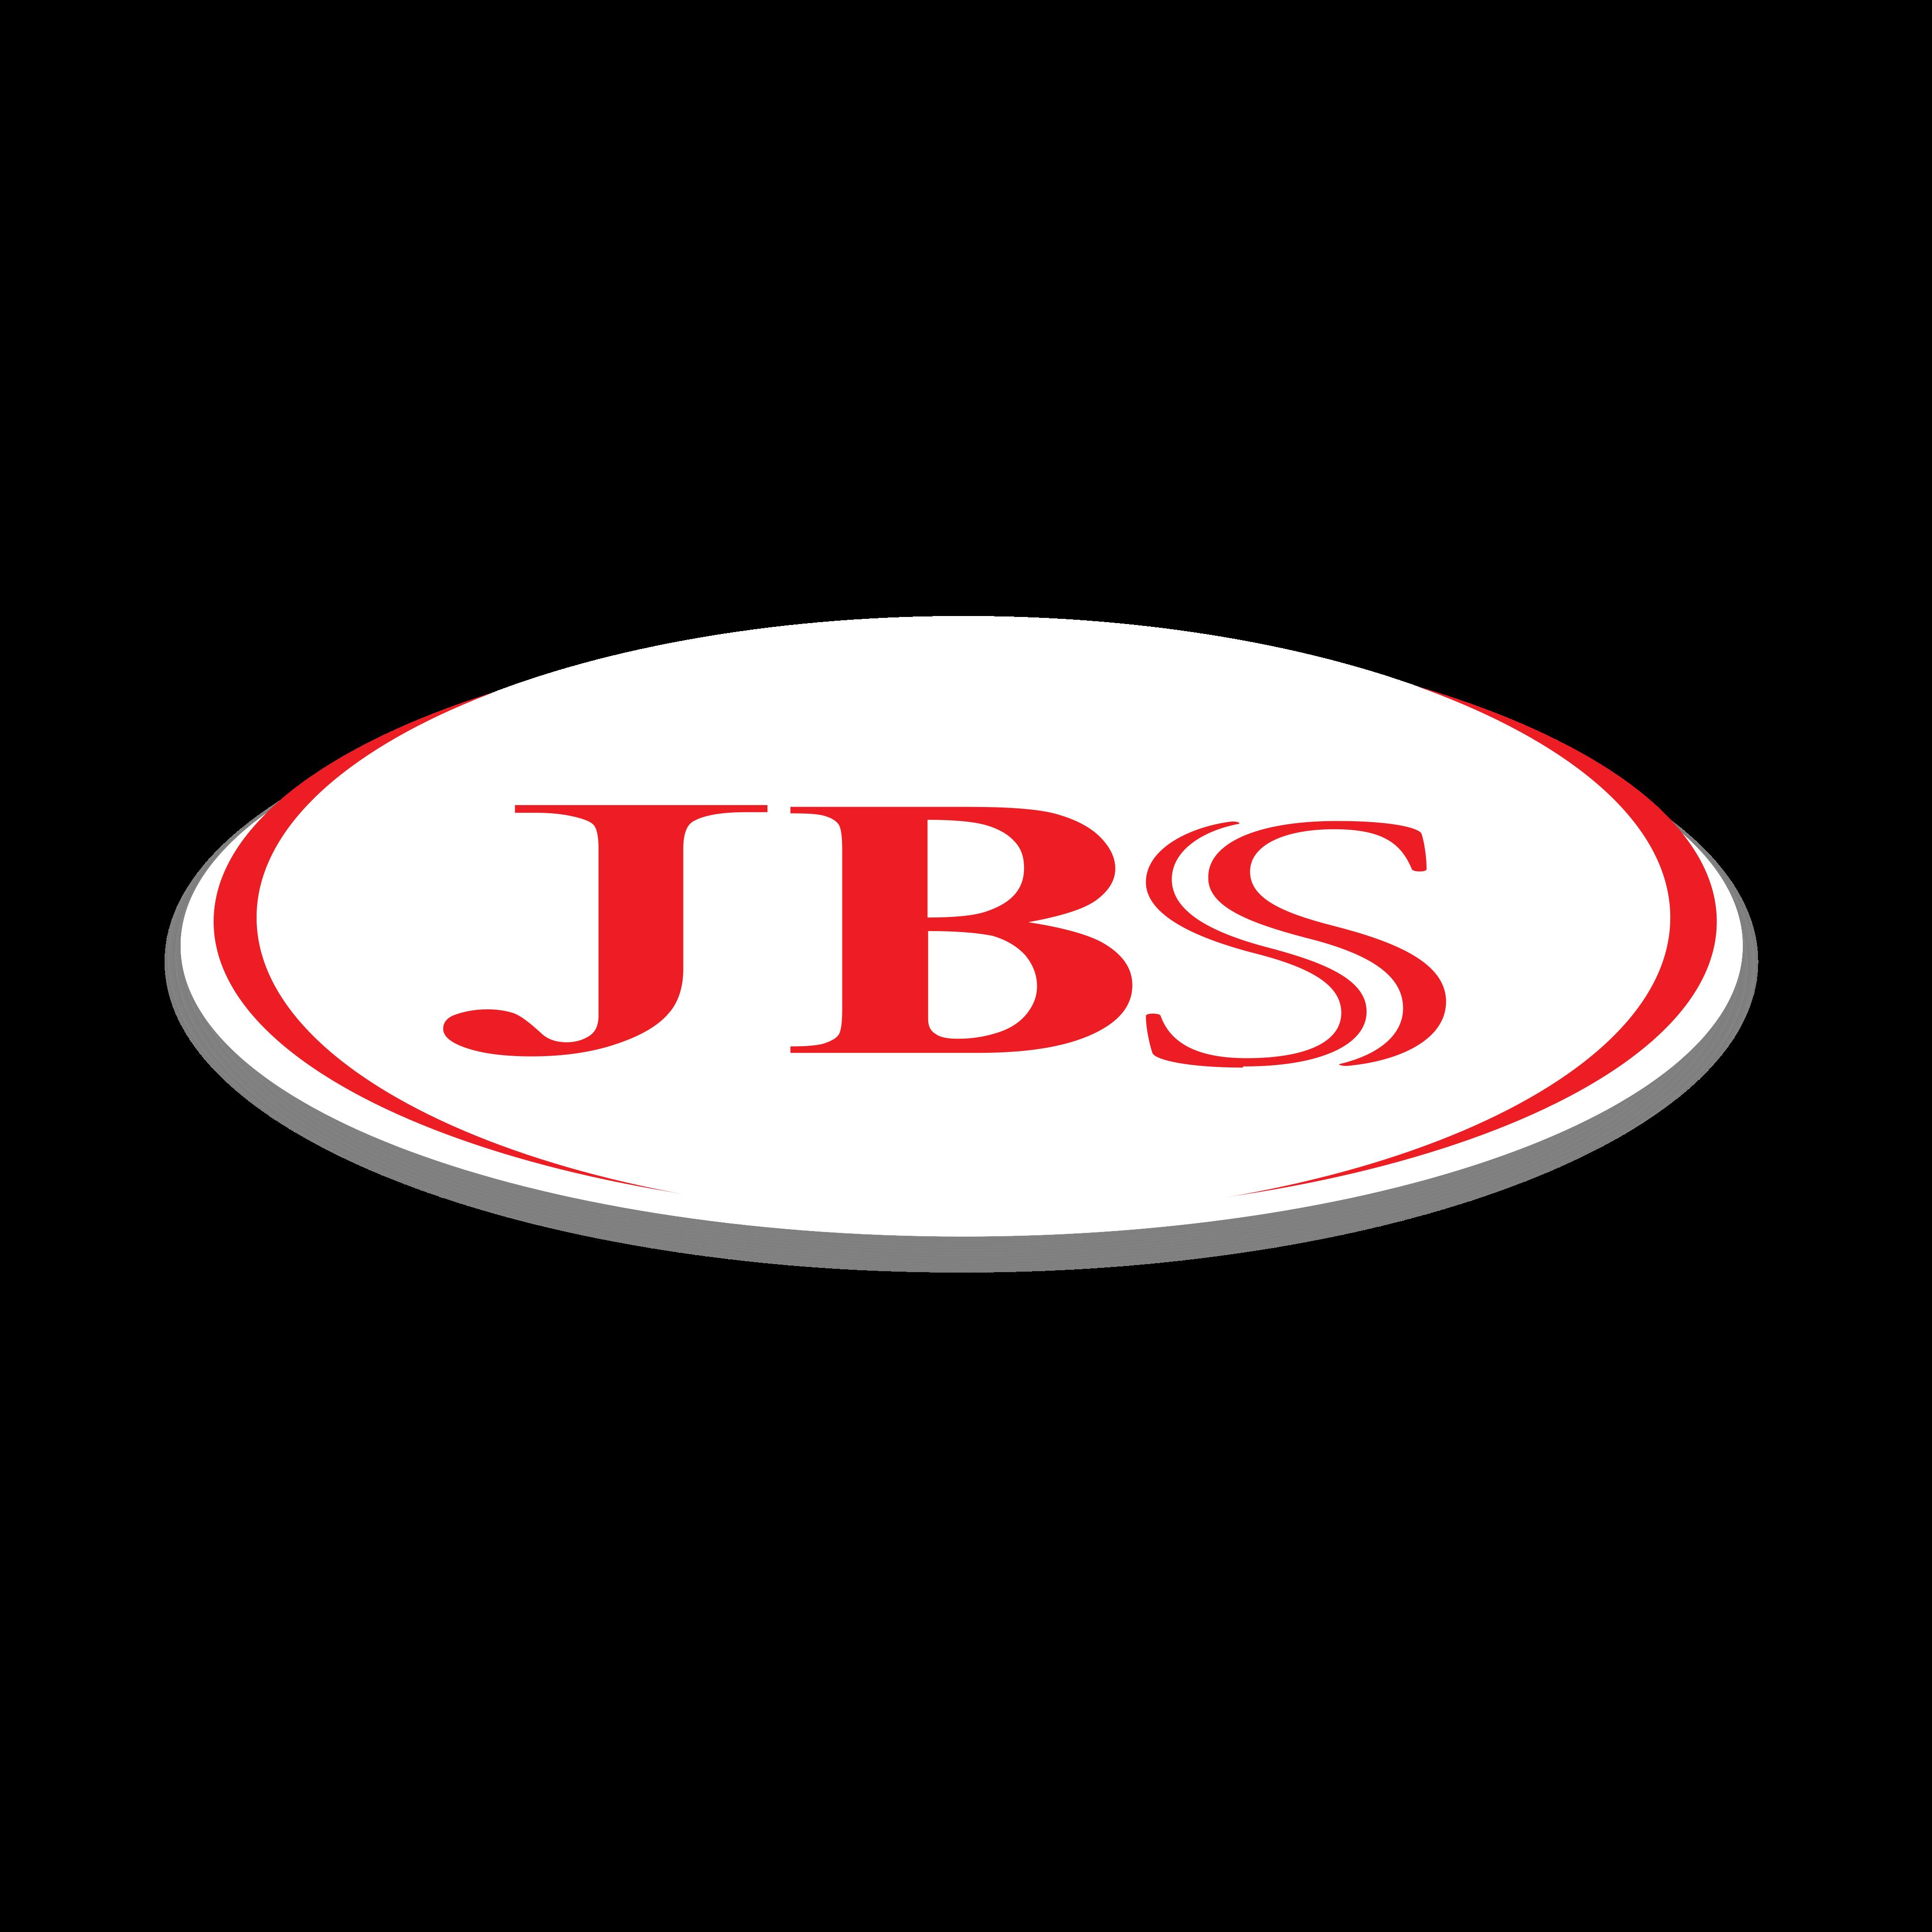 jbs logo 0 - JBS Foods Logo